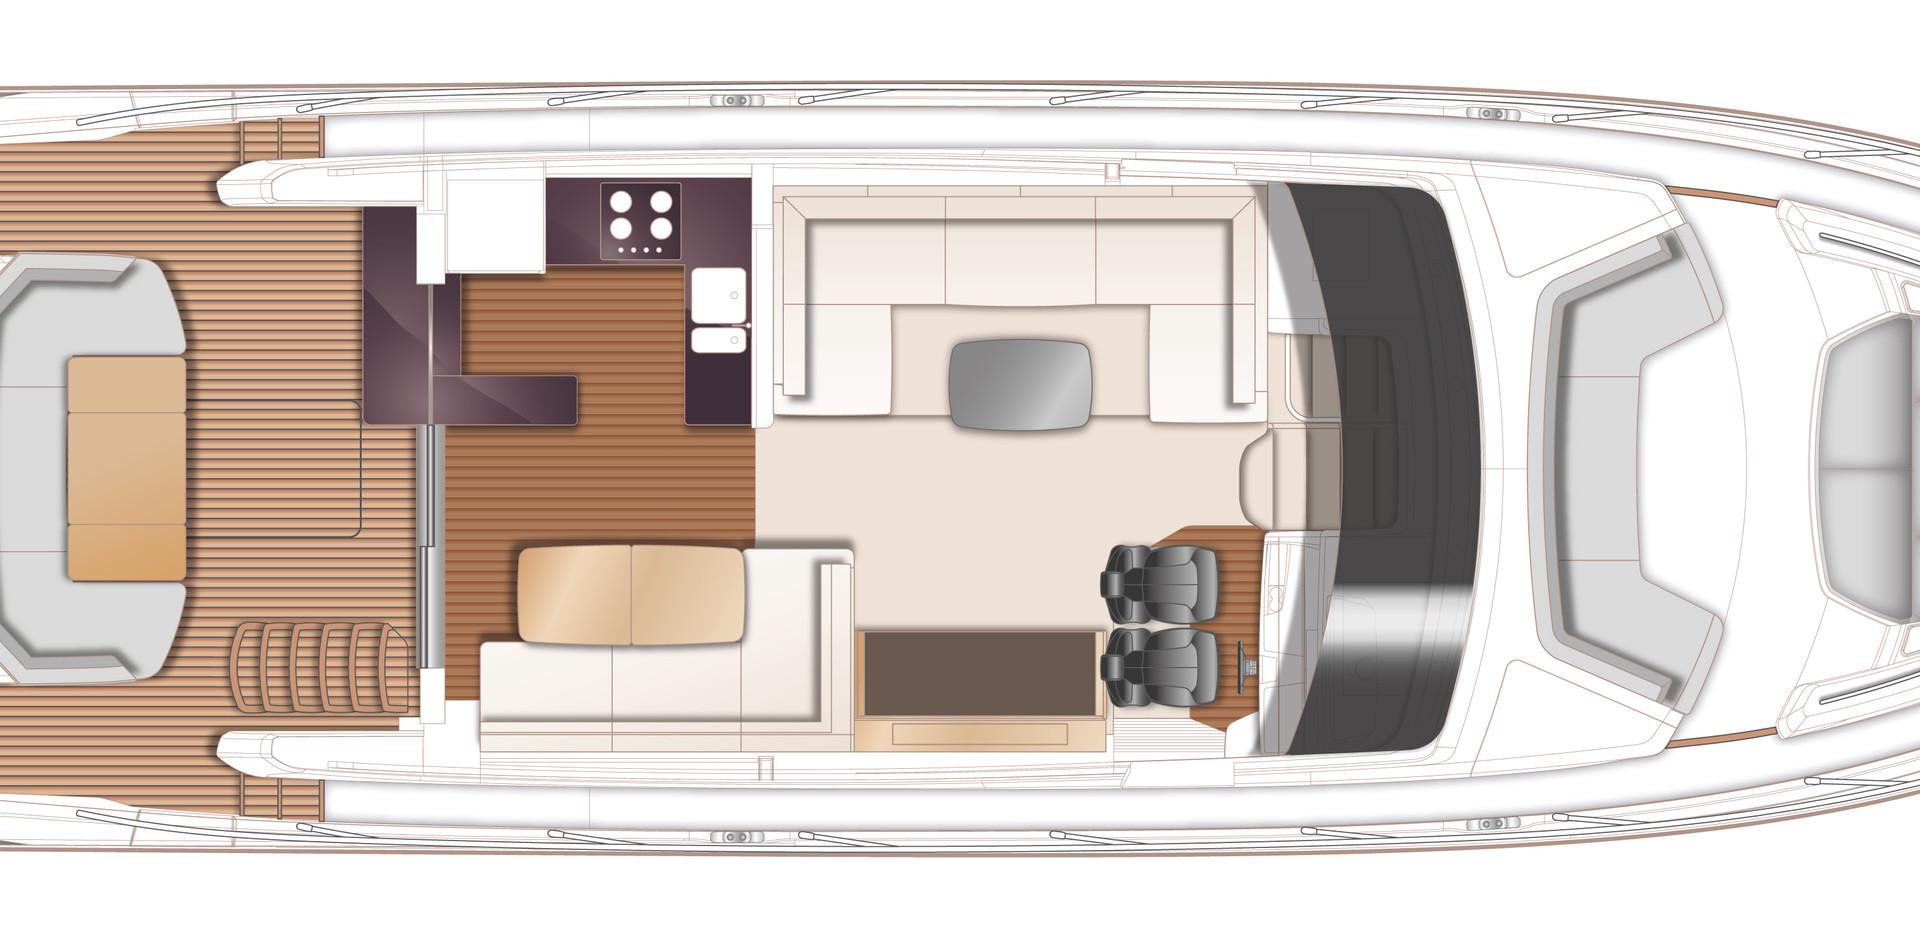 s66-layout-main-deck.jpg